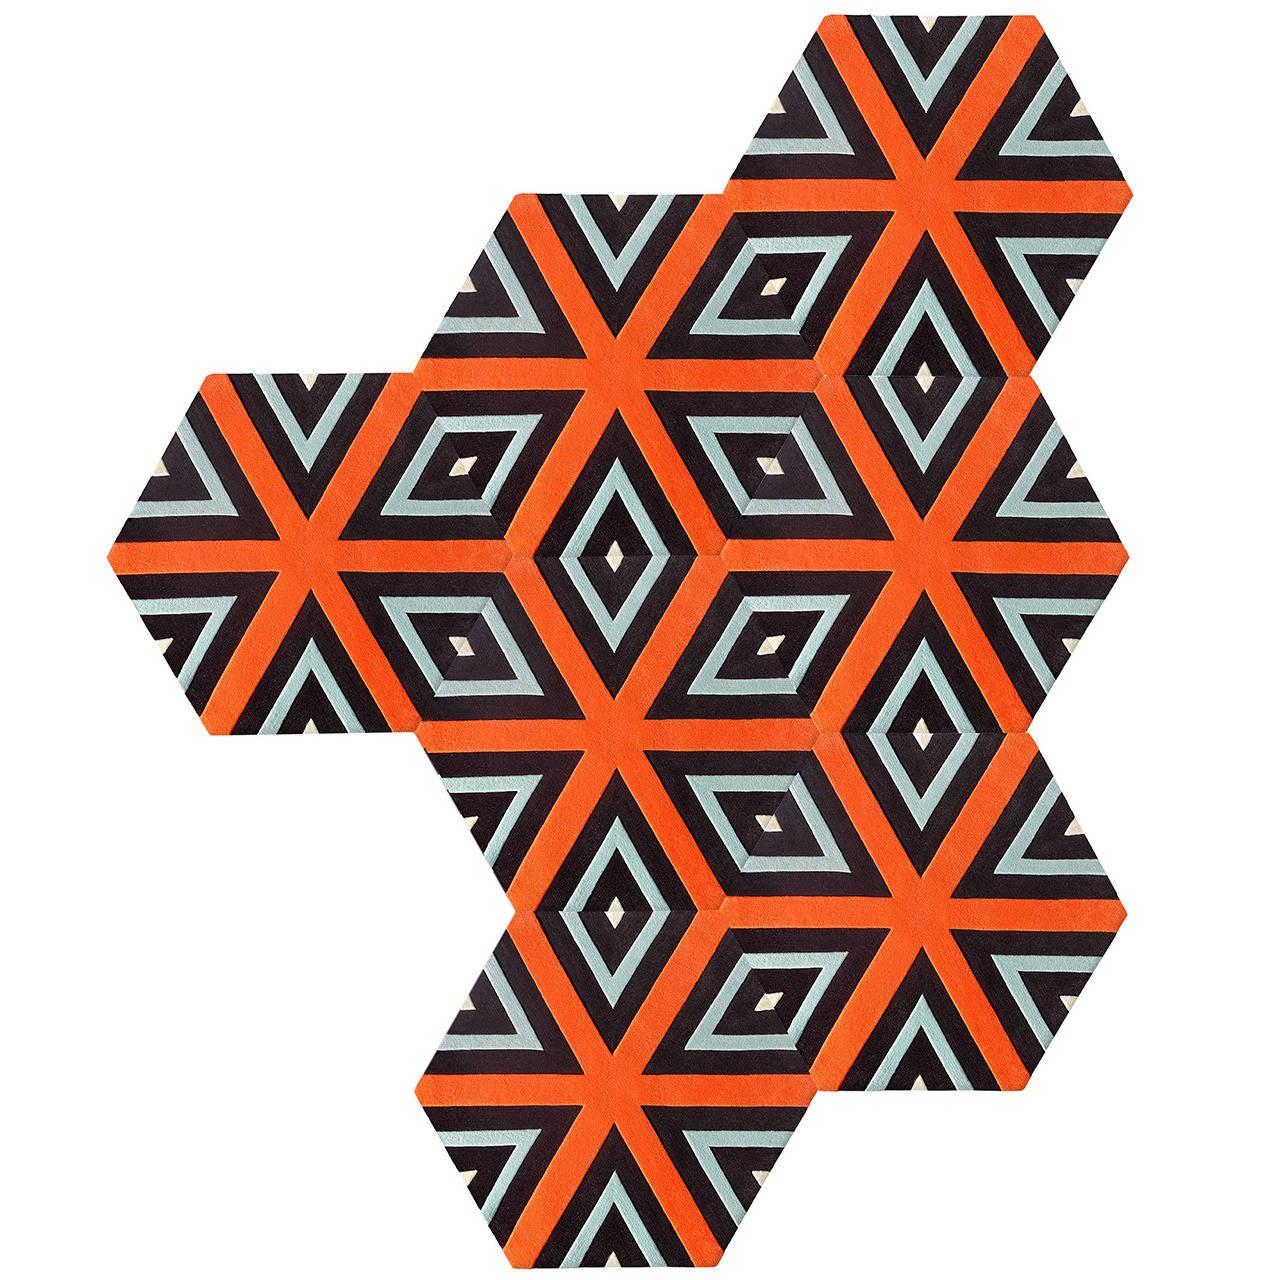 Kinder Ground Cubist Deconstructed Hexagon Rug 1